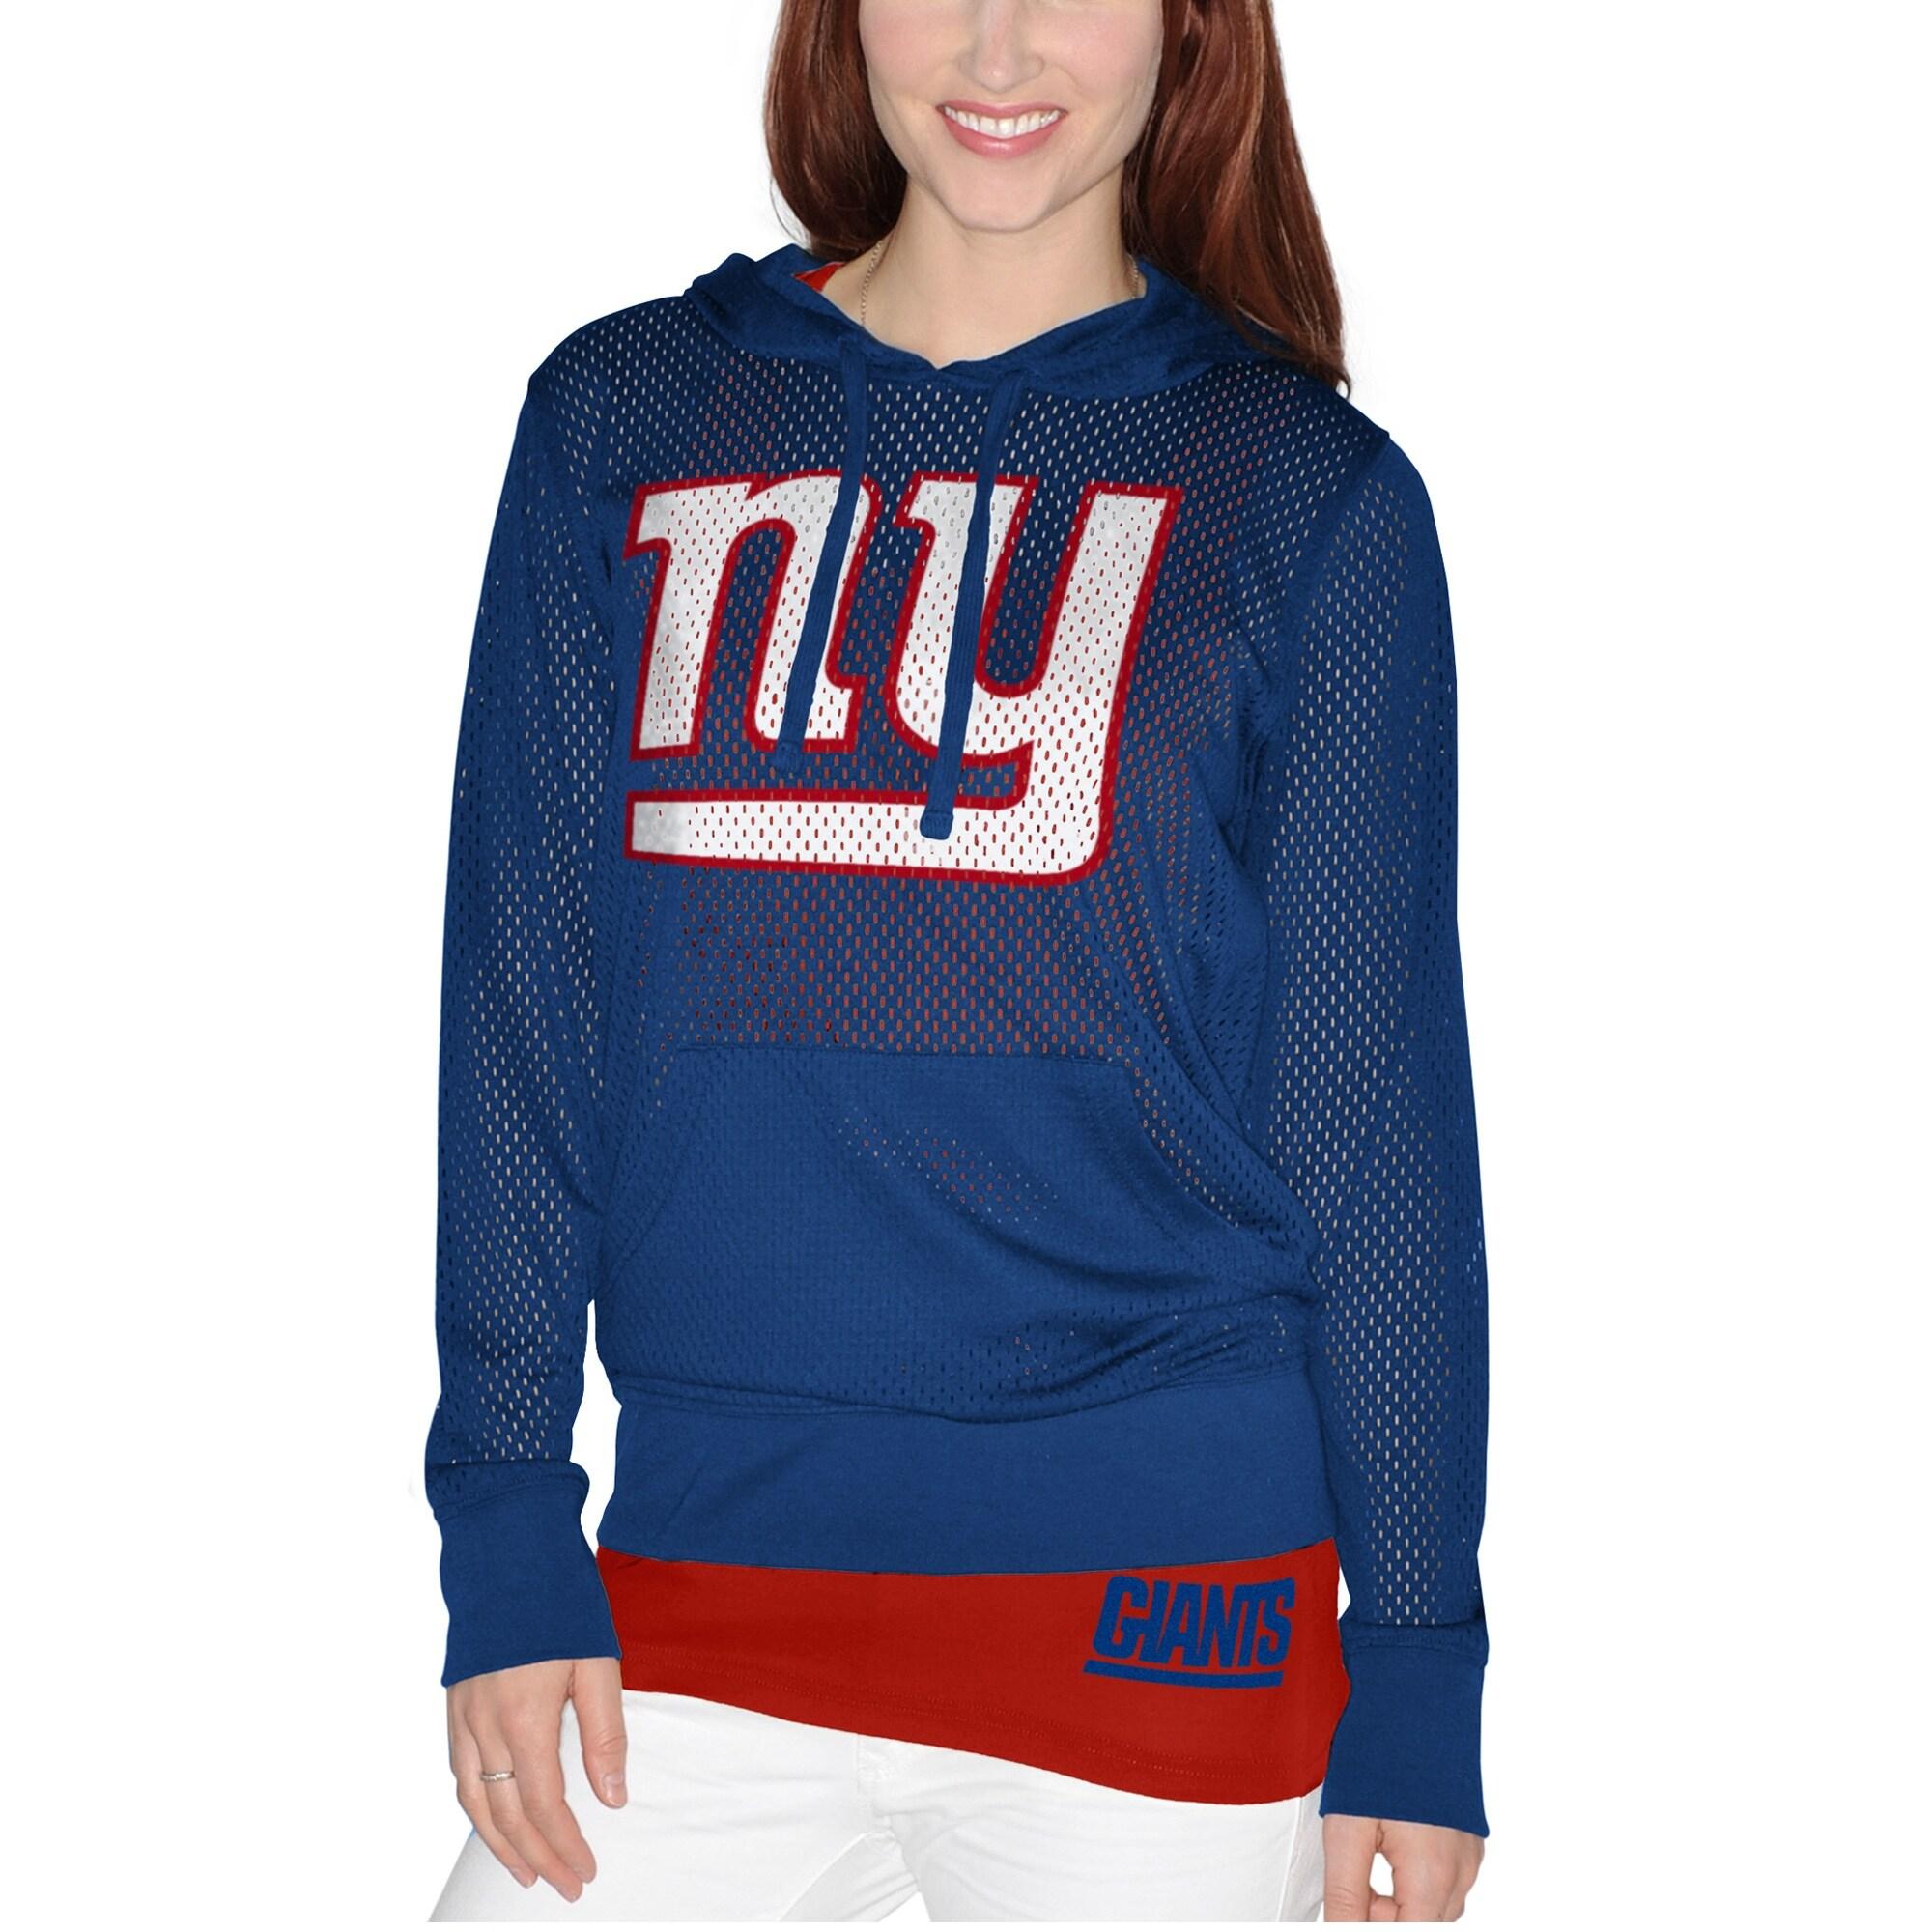 New York Giants Women's Holey Hoodie T-Shirt & Tank Top Set - Royal